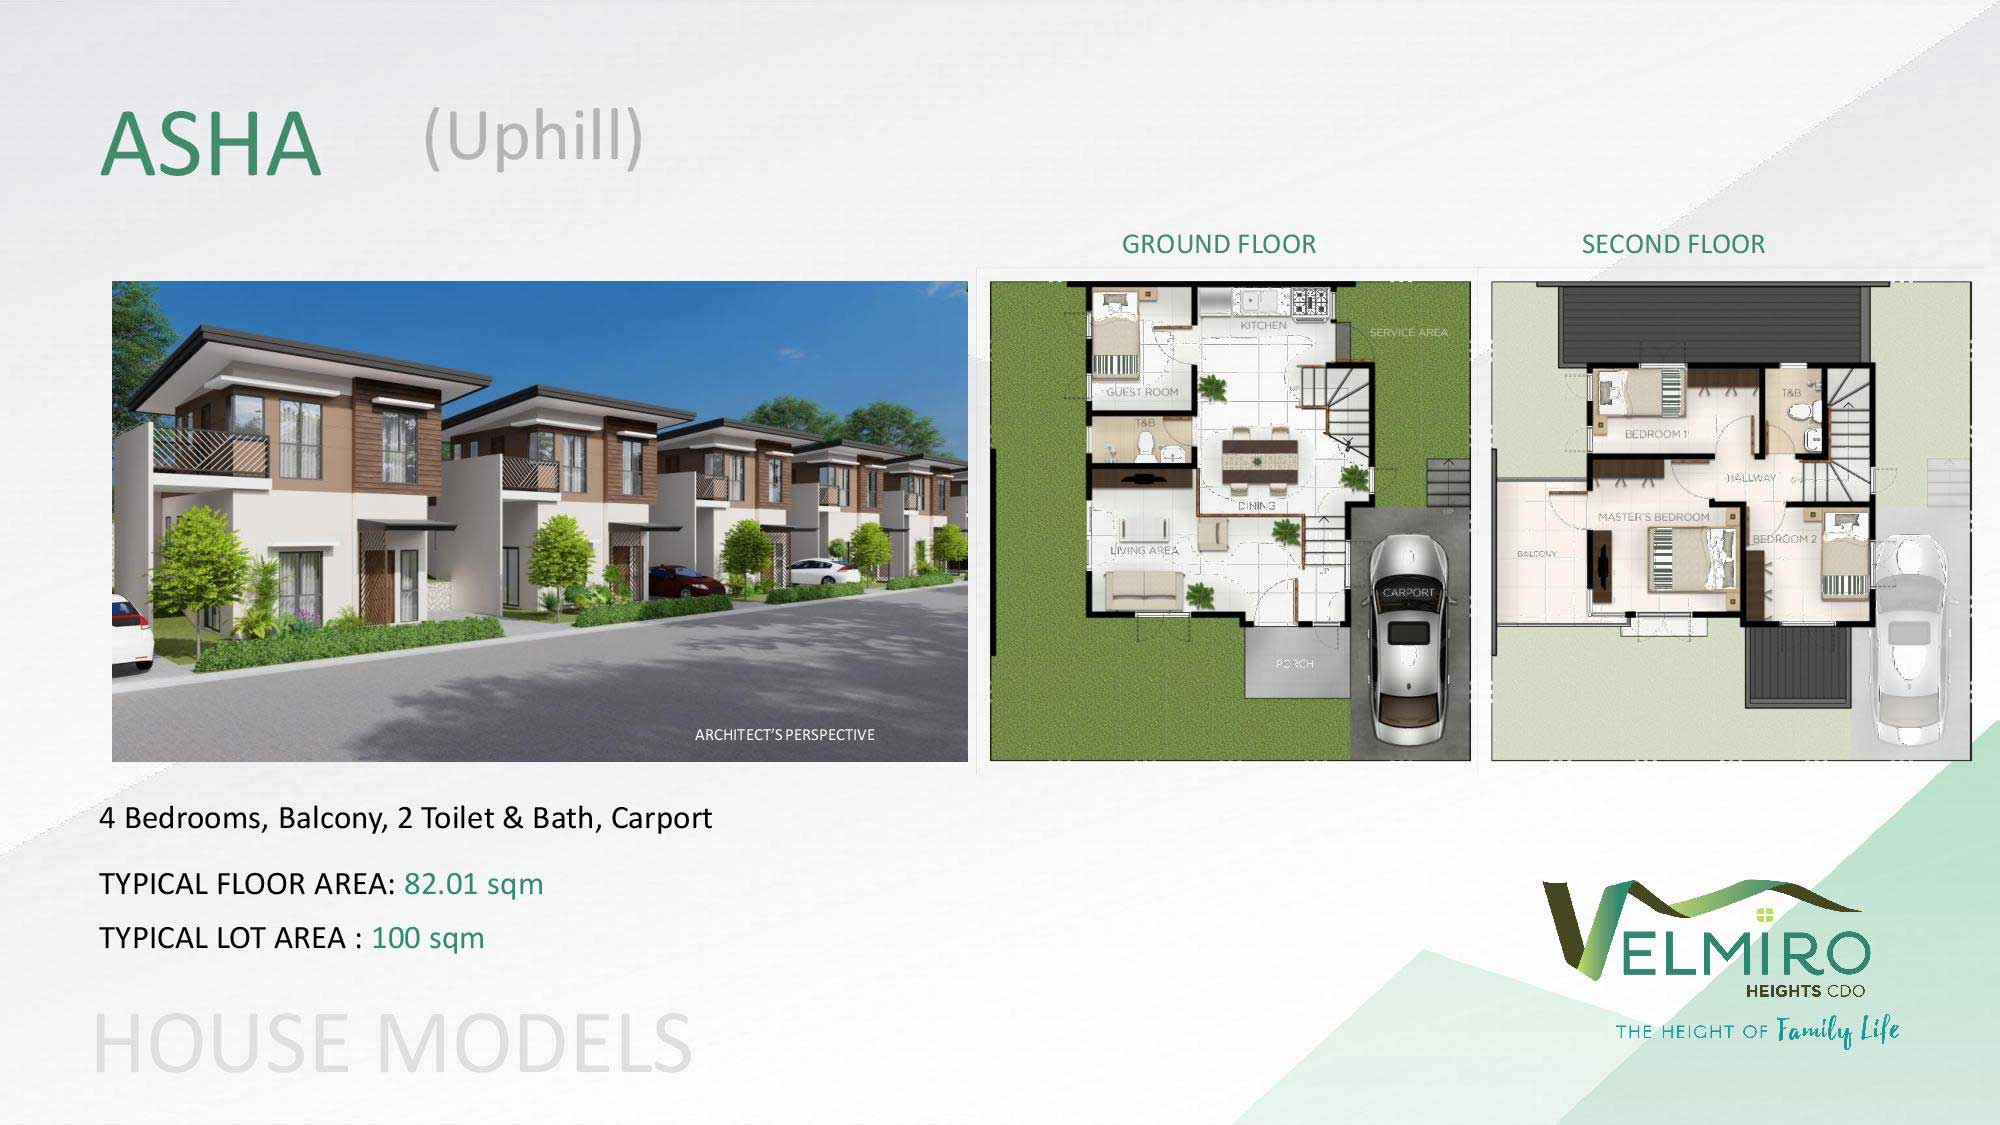 Velmiro heights agusan house model asha uphill web gmc